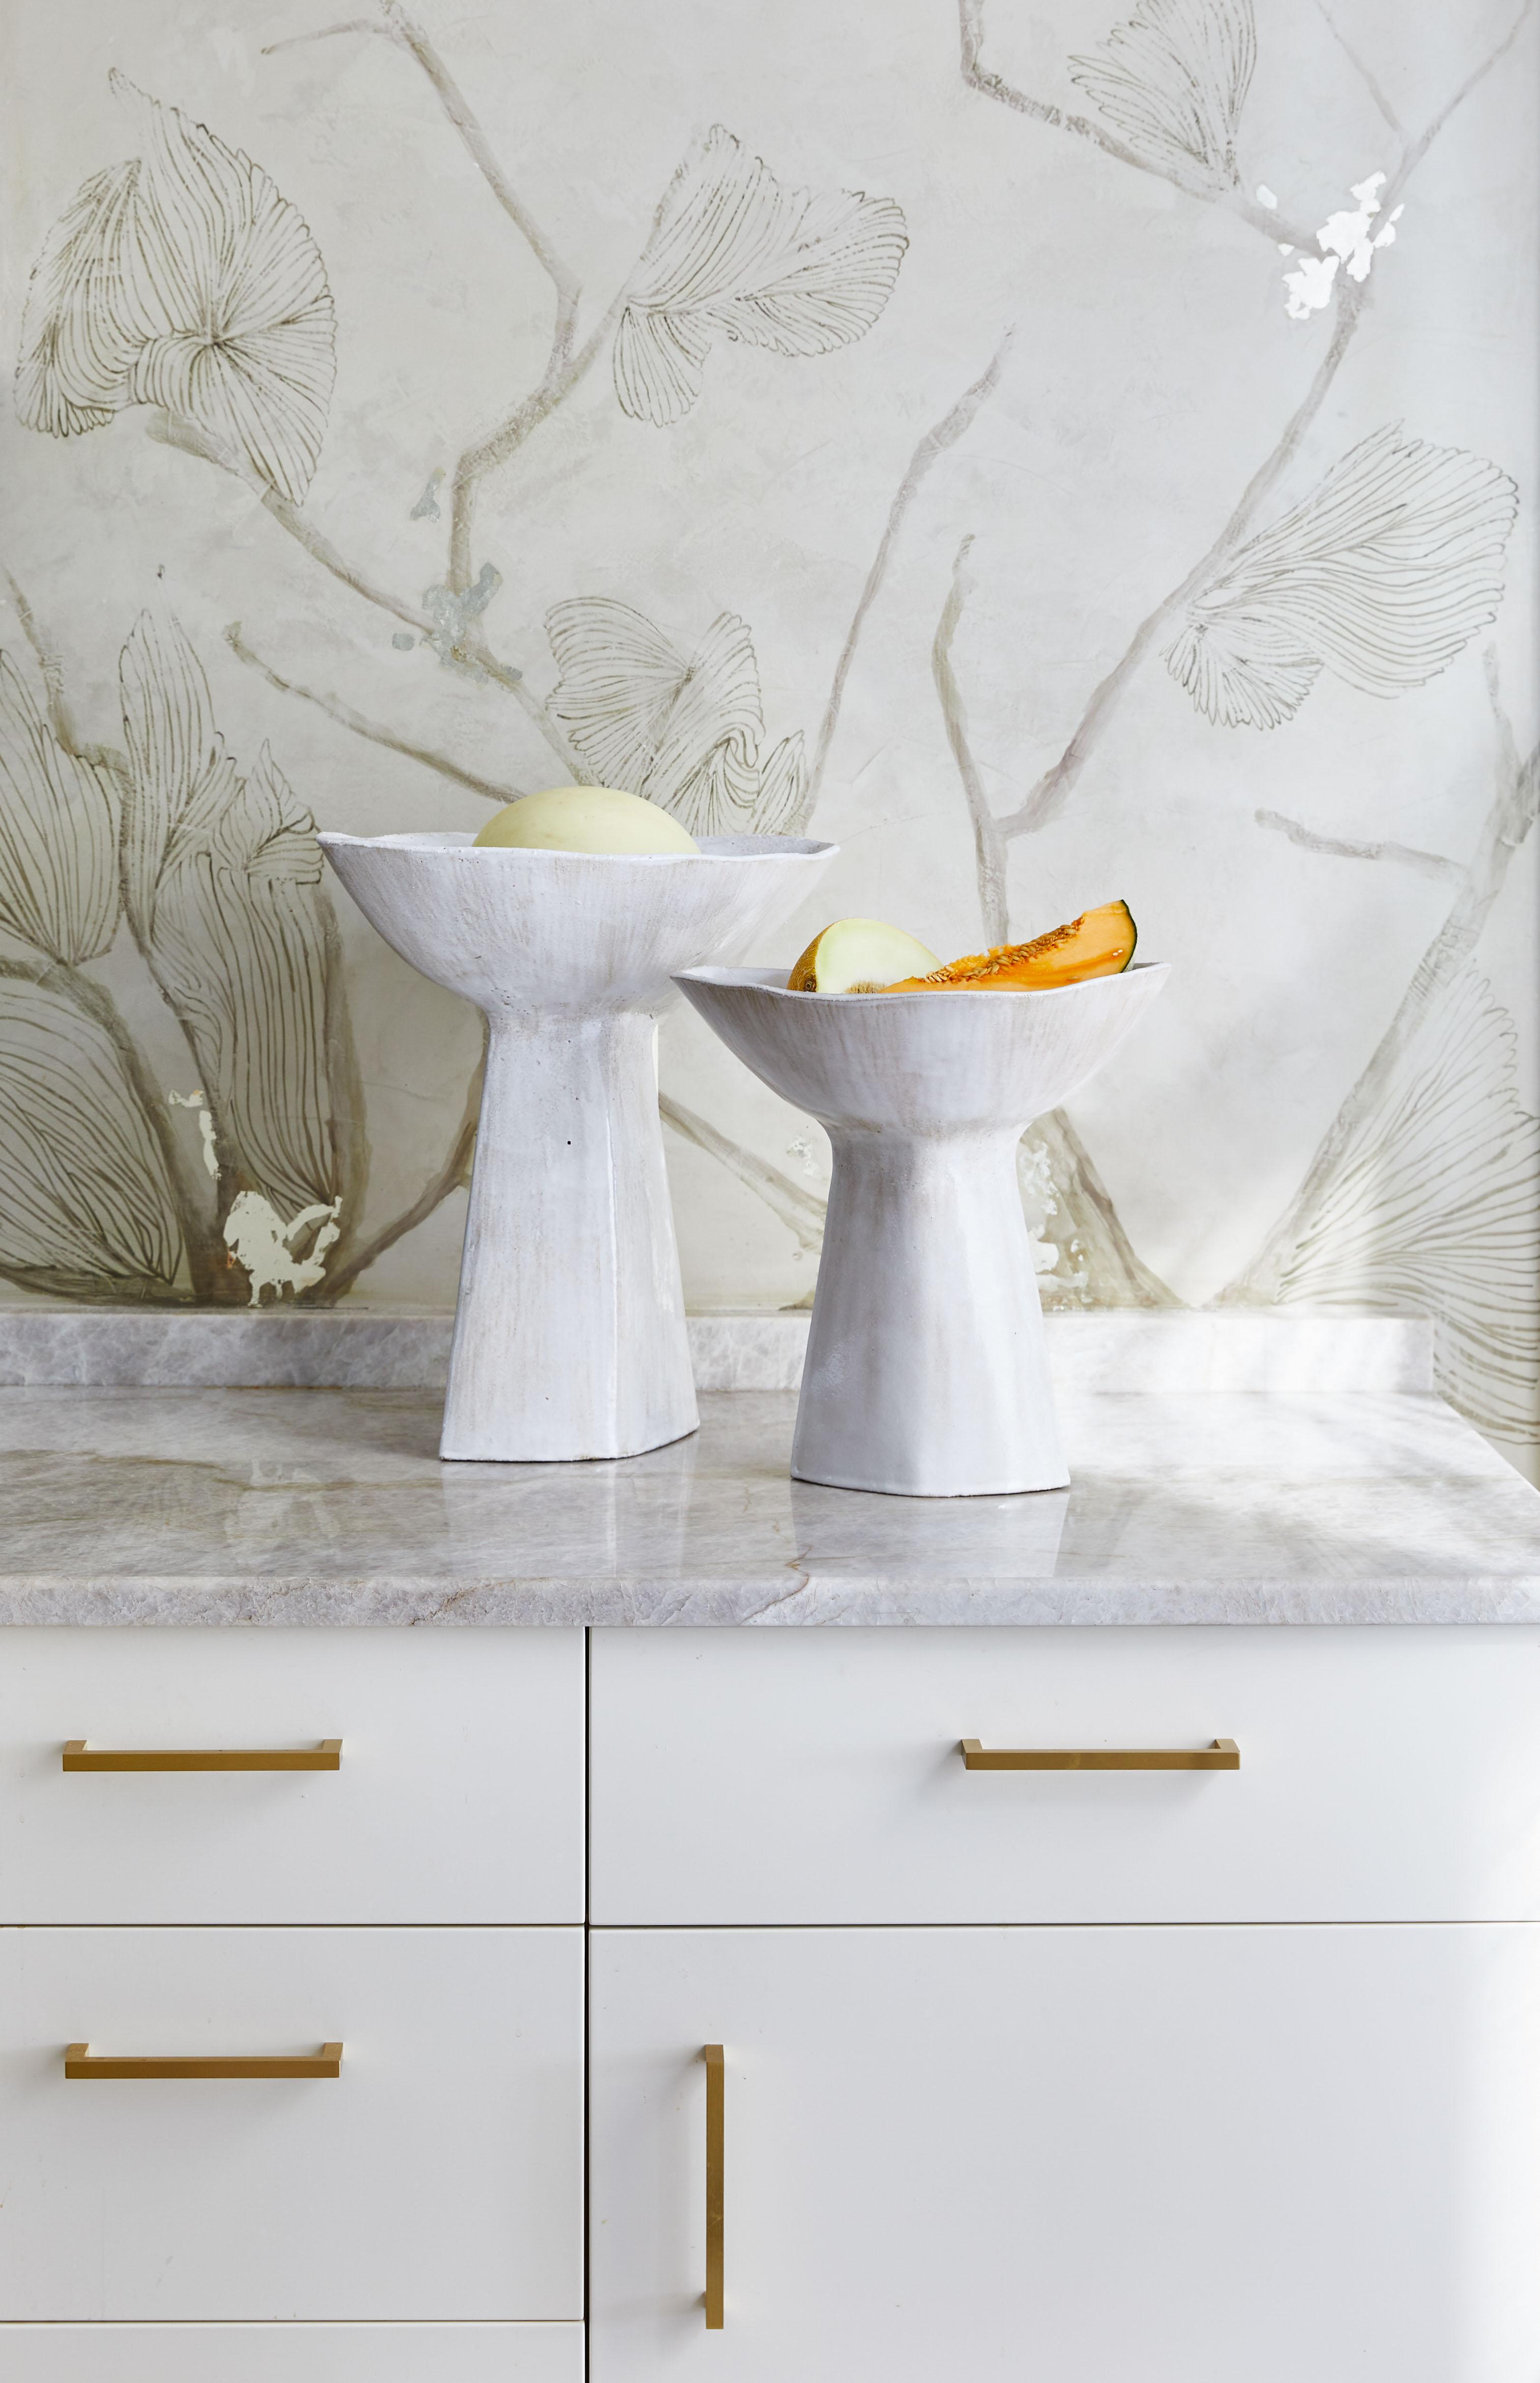 Custom Kitchen Details, Naturel sur Scène, Home Design - Valerie Legras Atelier